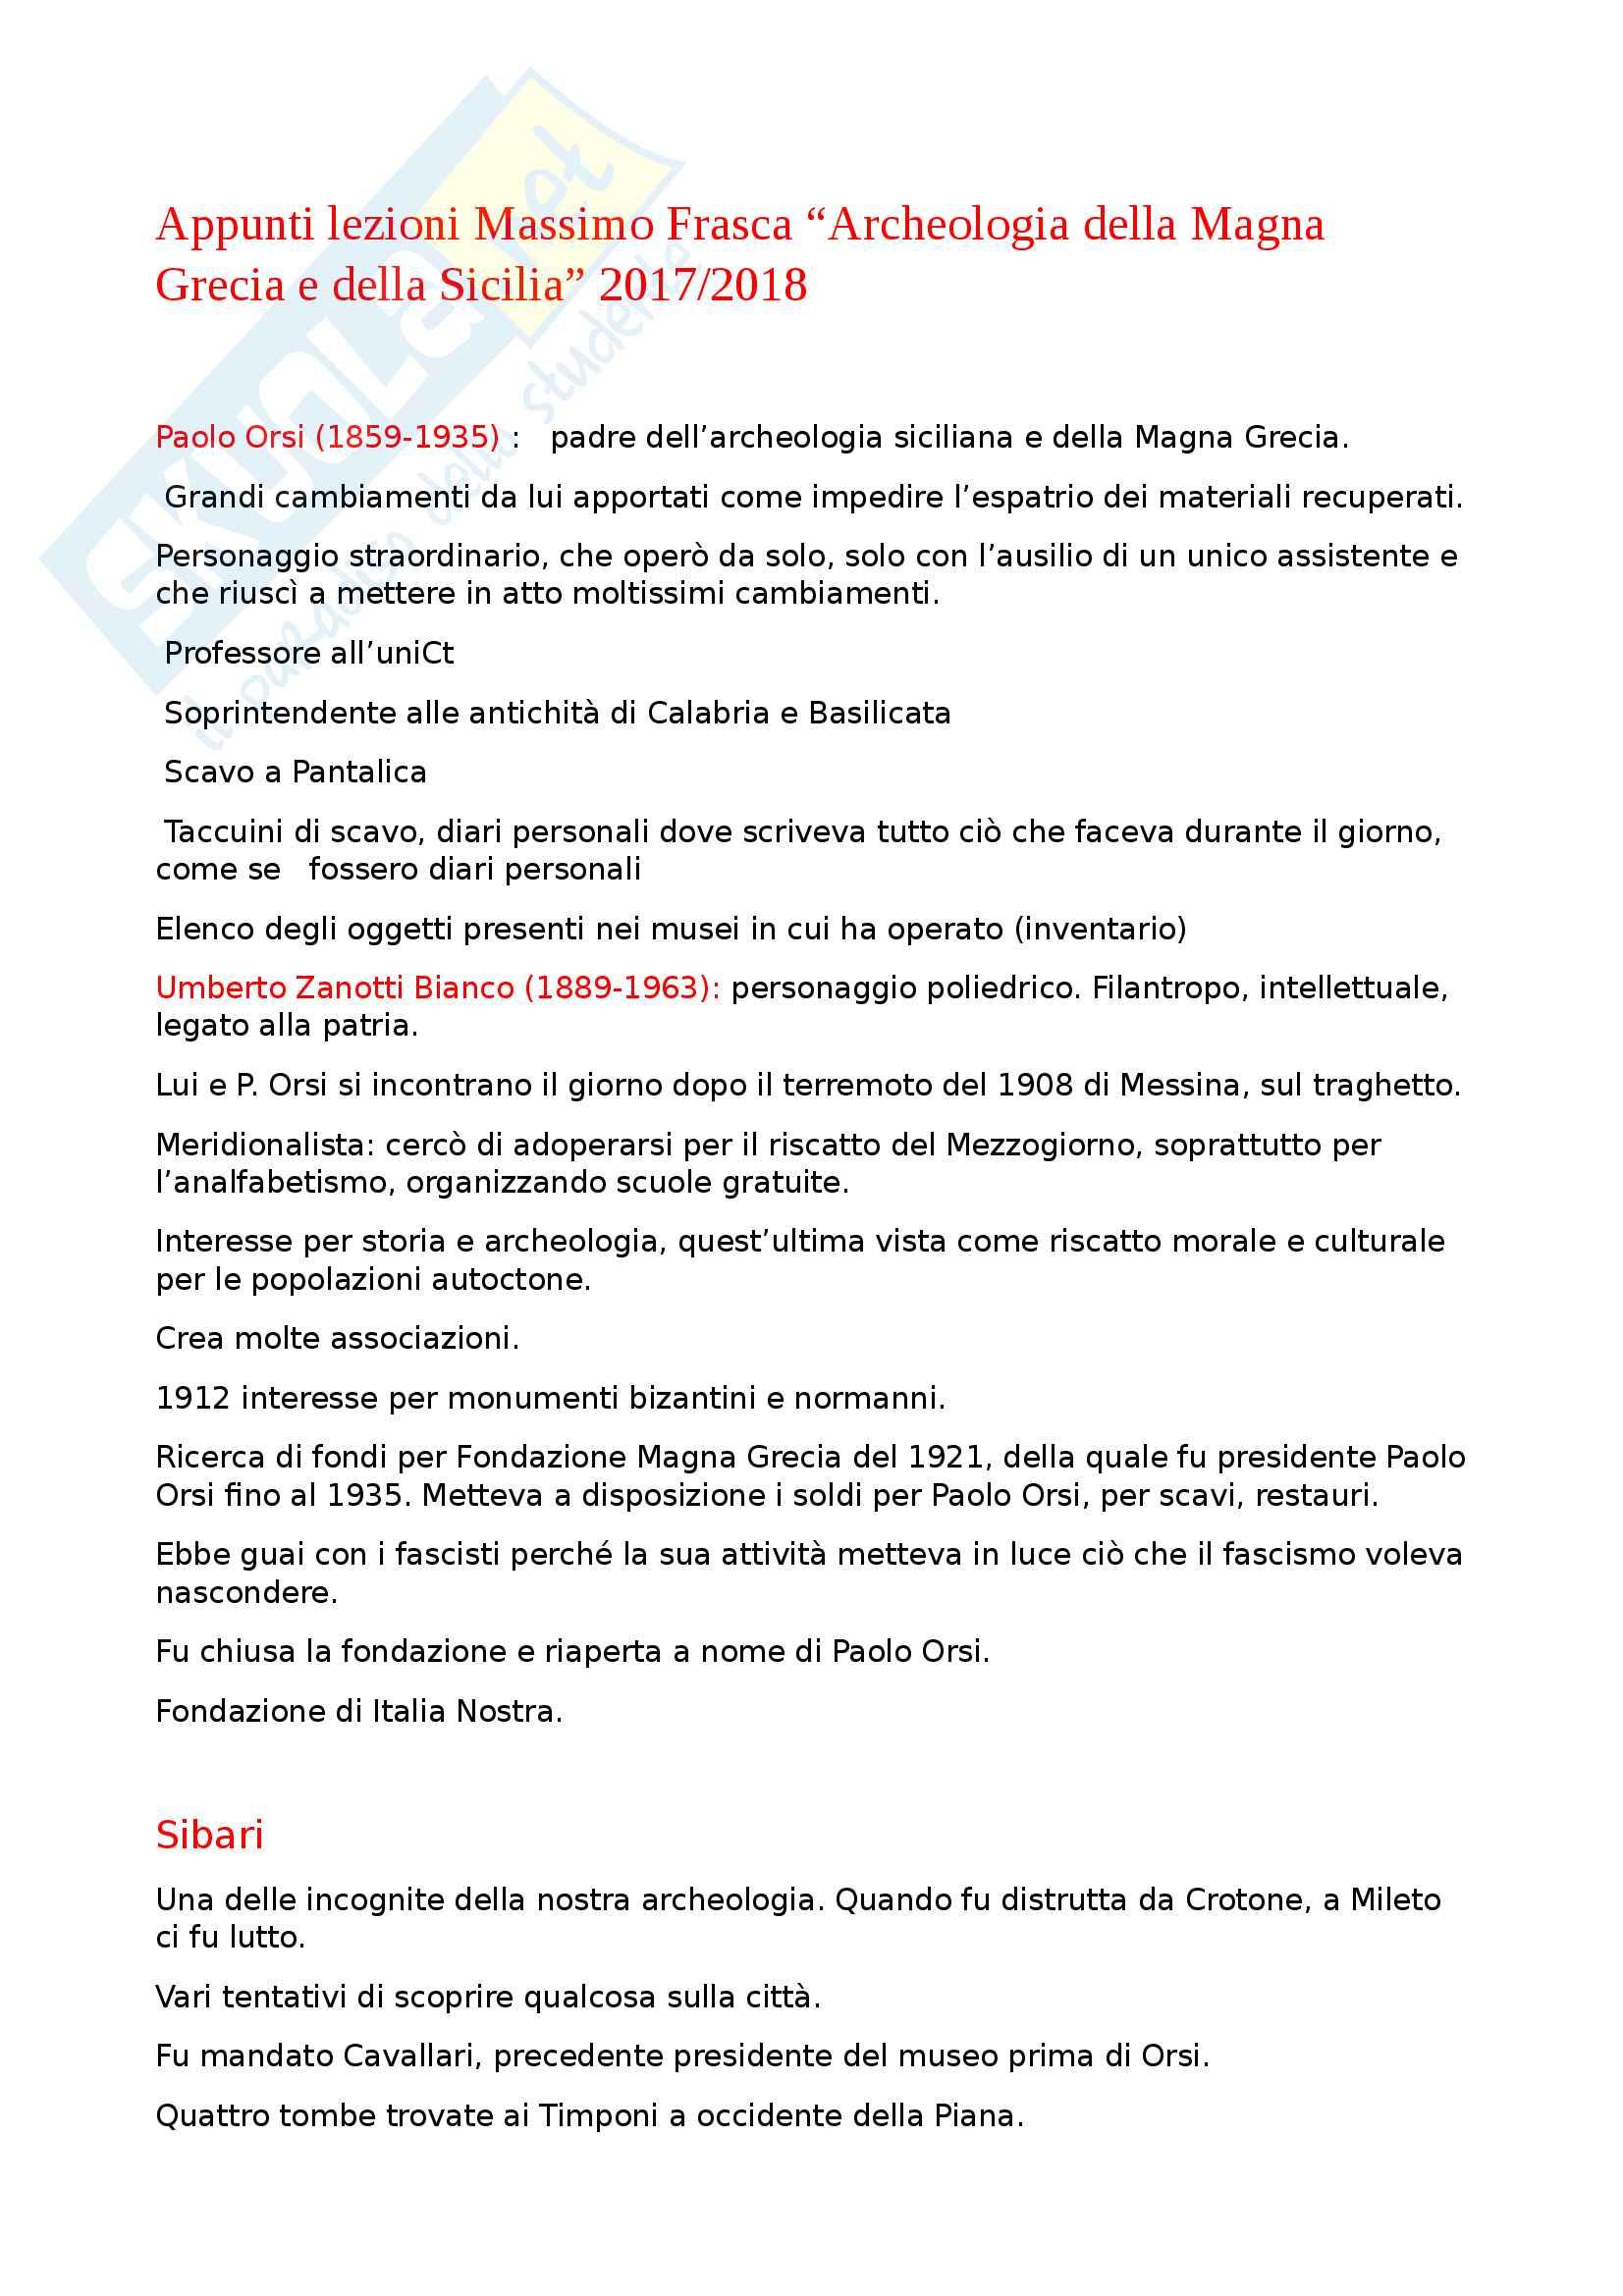 Appunti lezioni Massimo Frasca